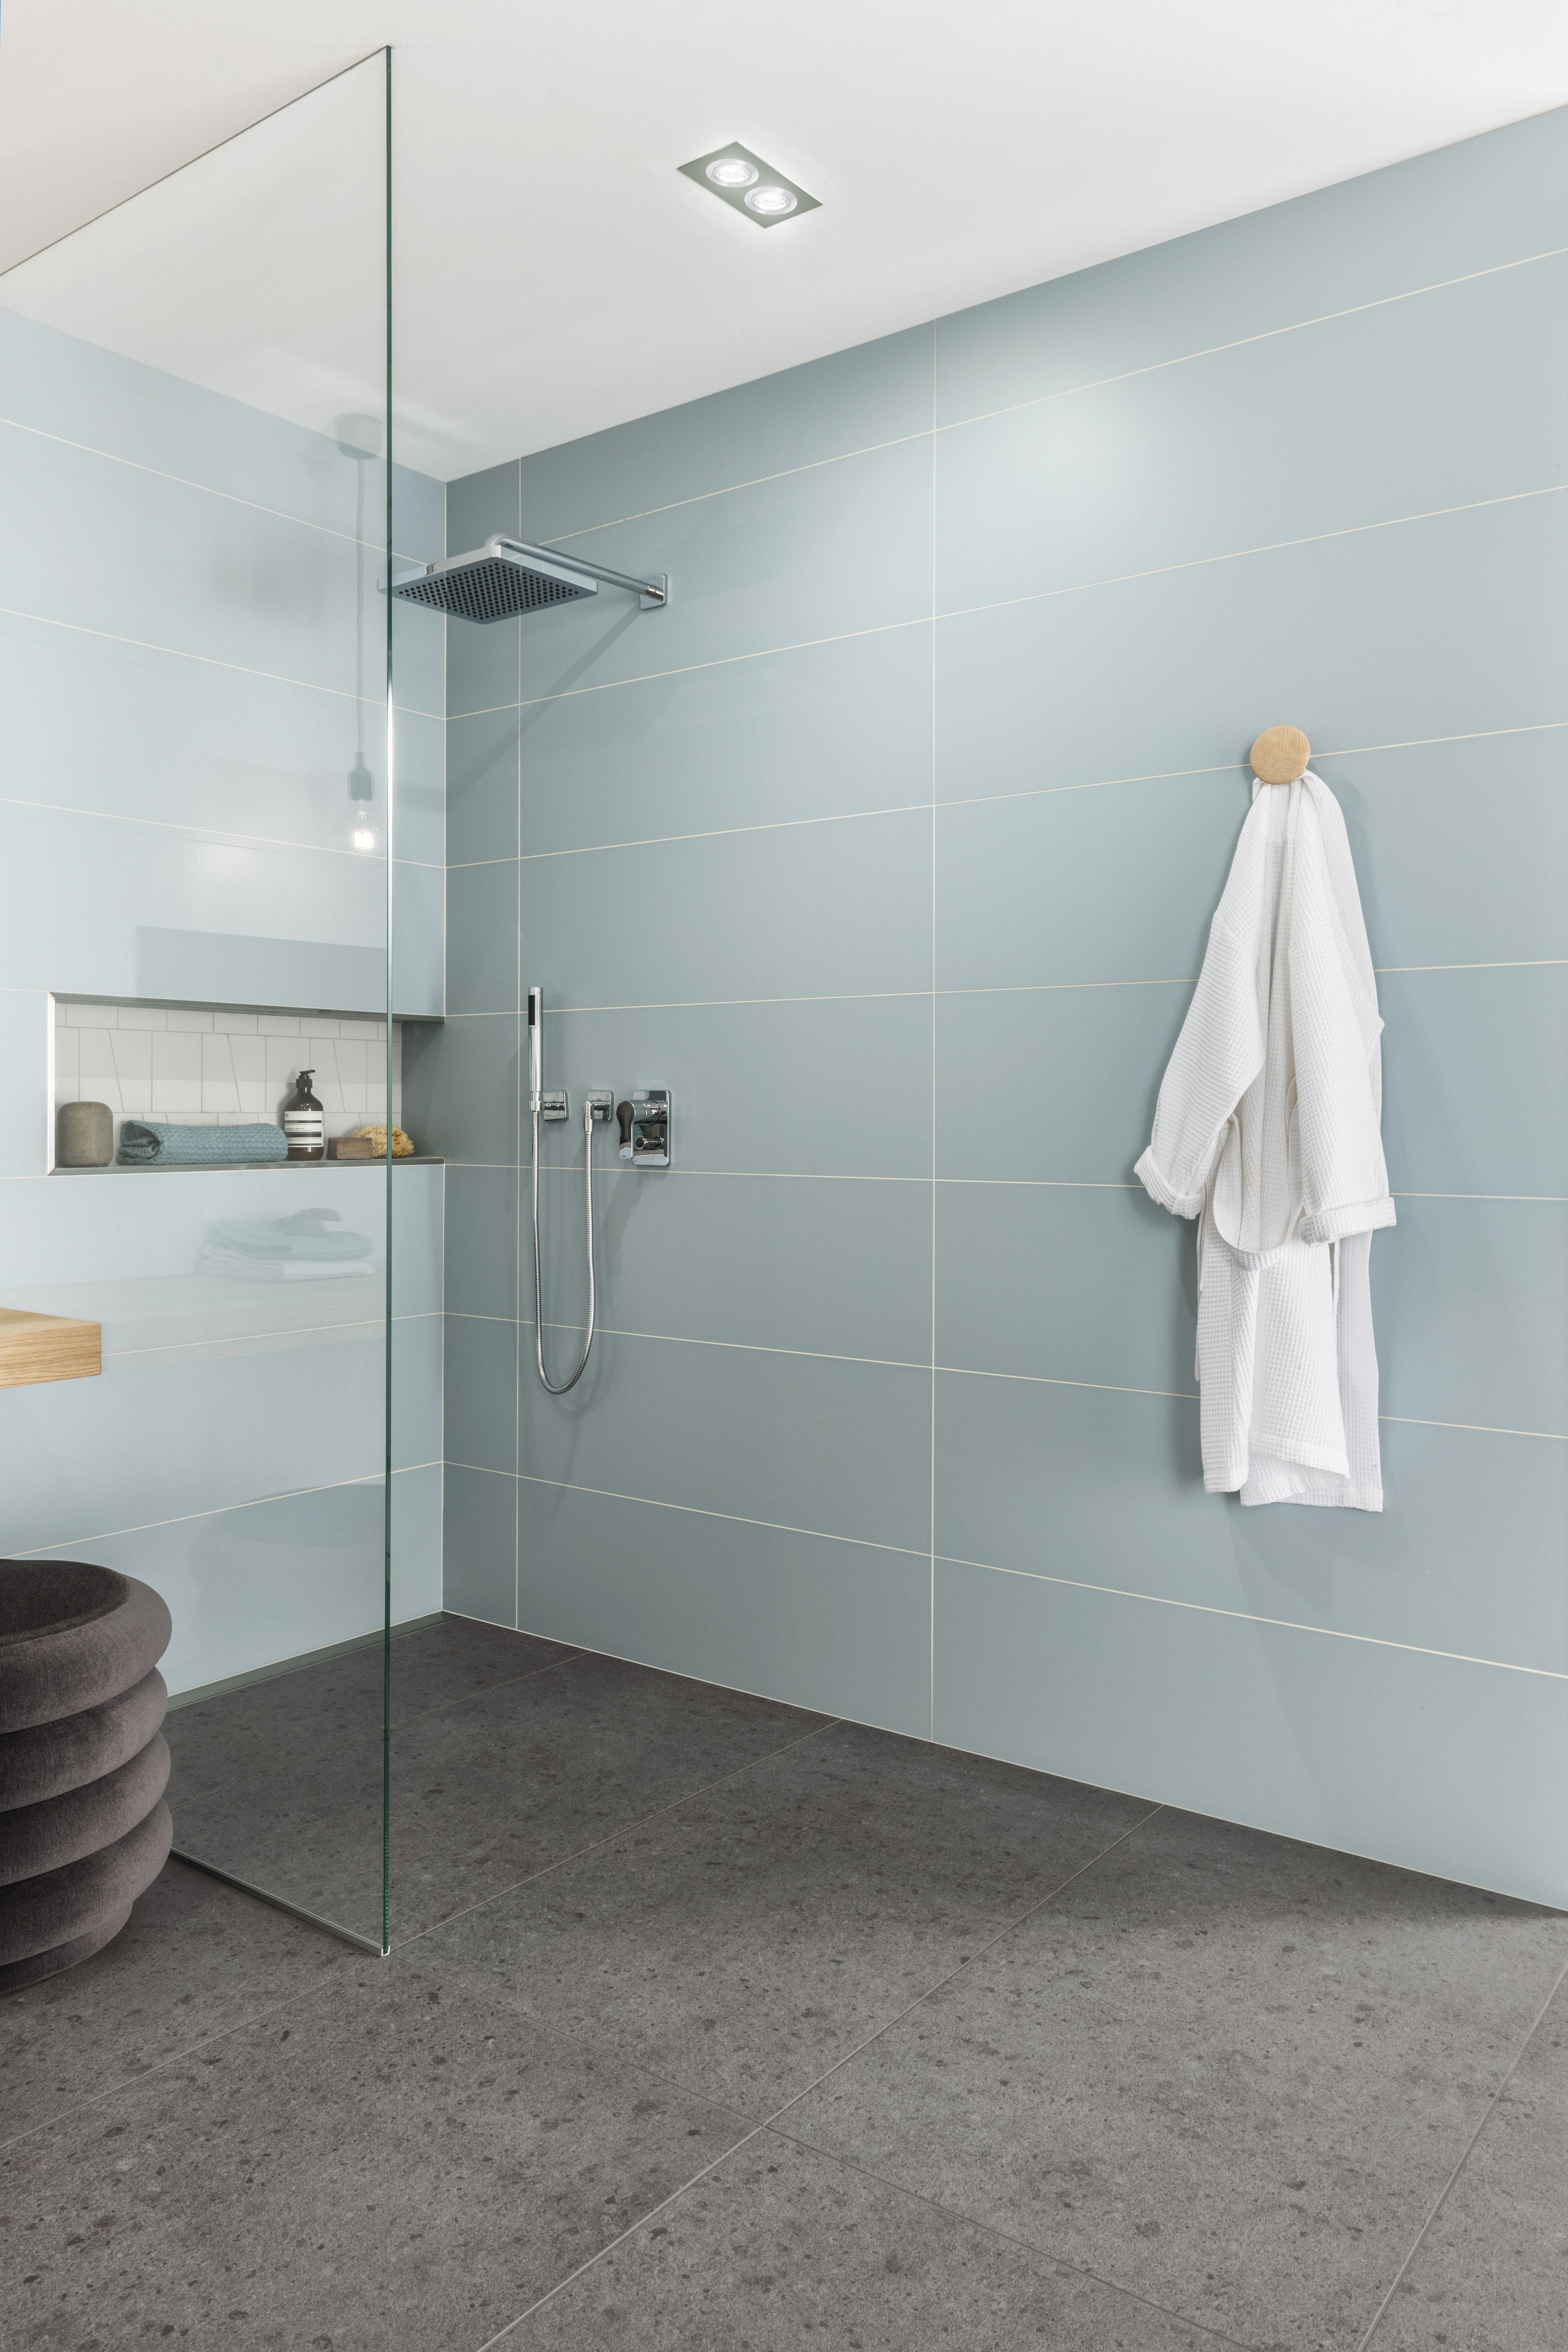 Fliesen In Pastellfarben Bad Fliesen Ideen Badezimmer Trends Villeroy Boch Fliesen